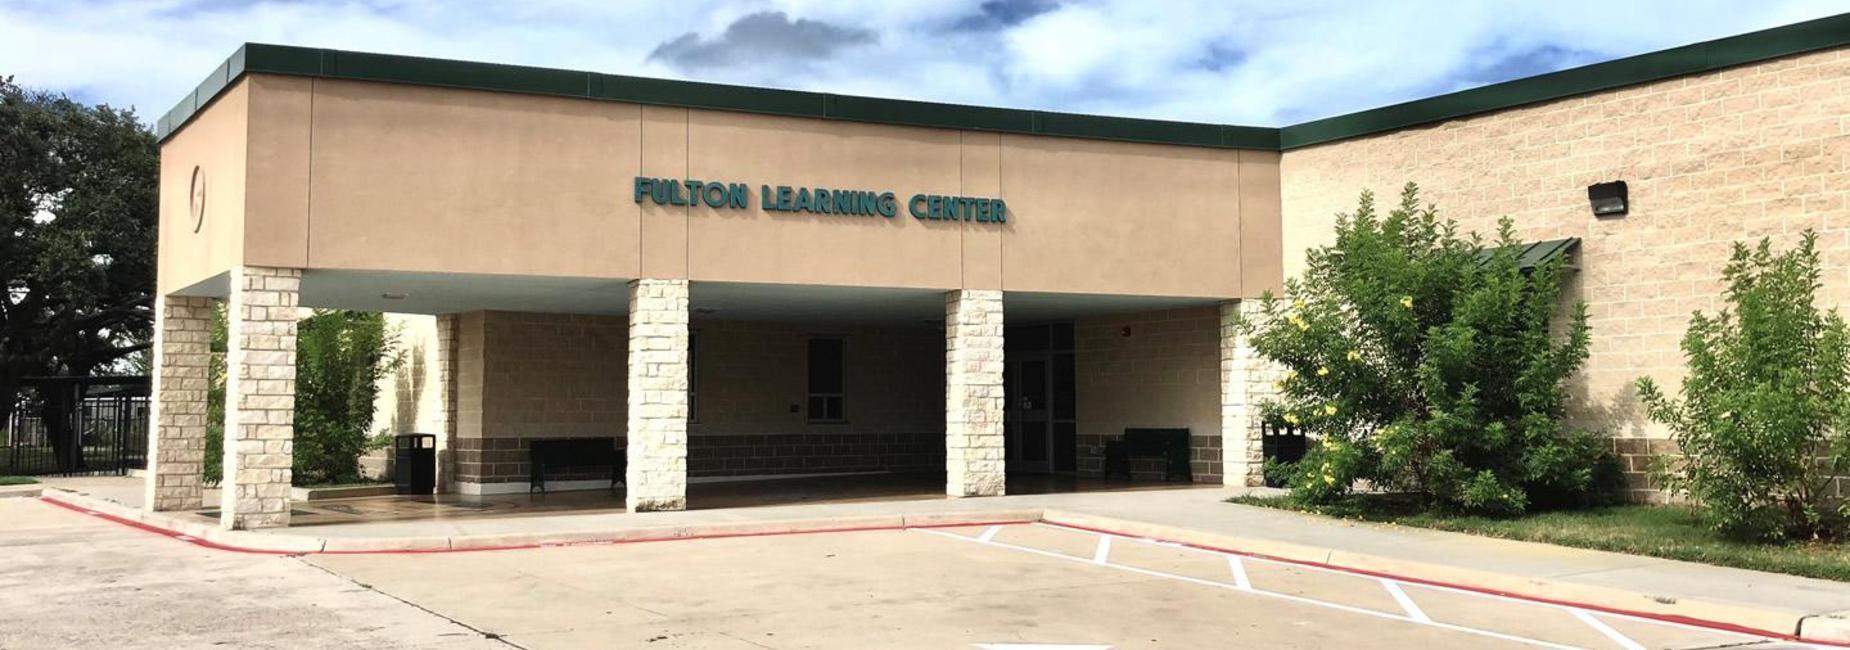 Fulton Learning Center